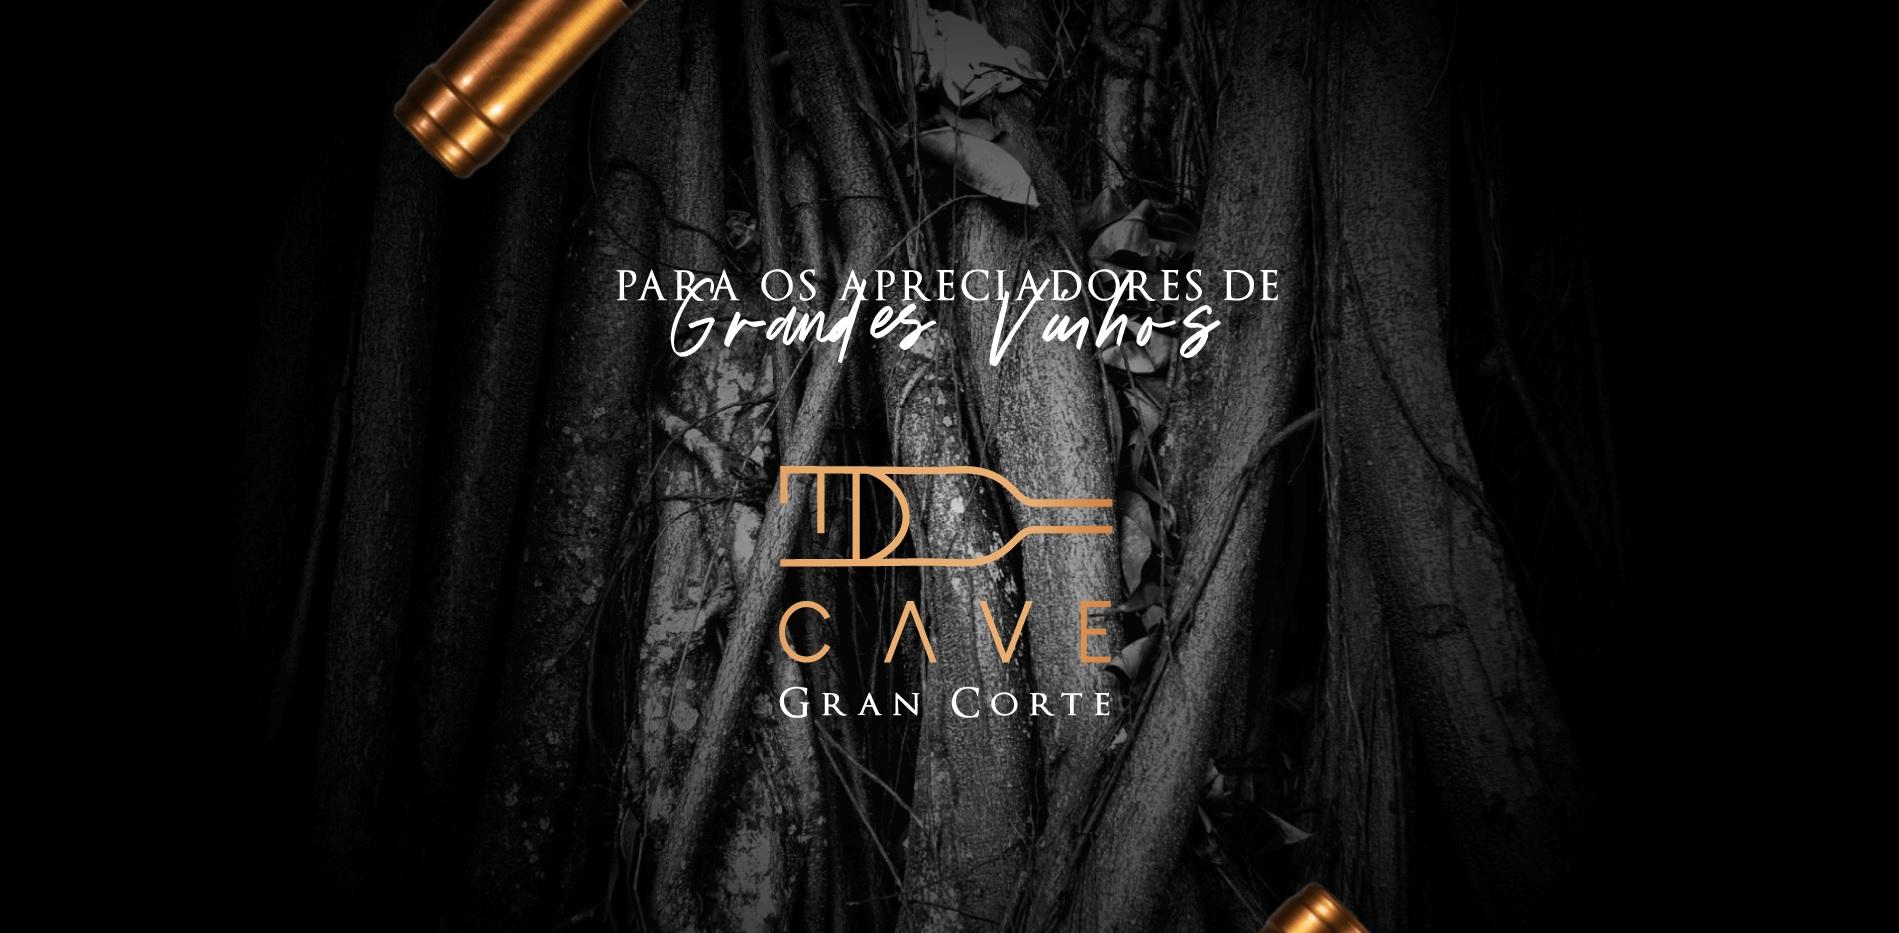 Cave Gran Corte - Lançamento - Capa